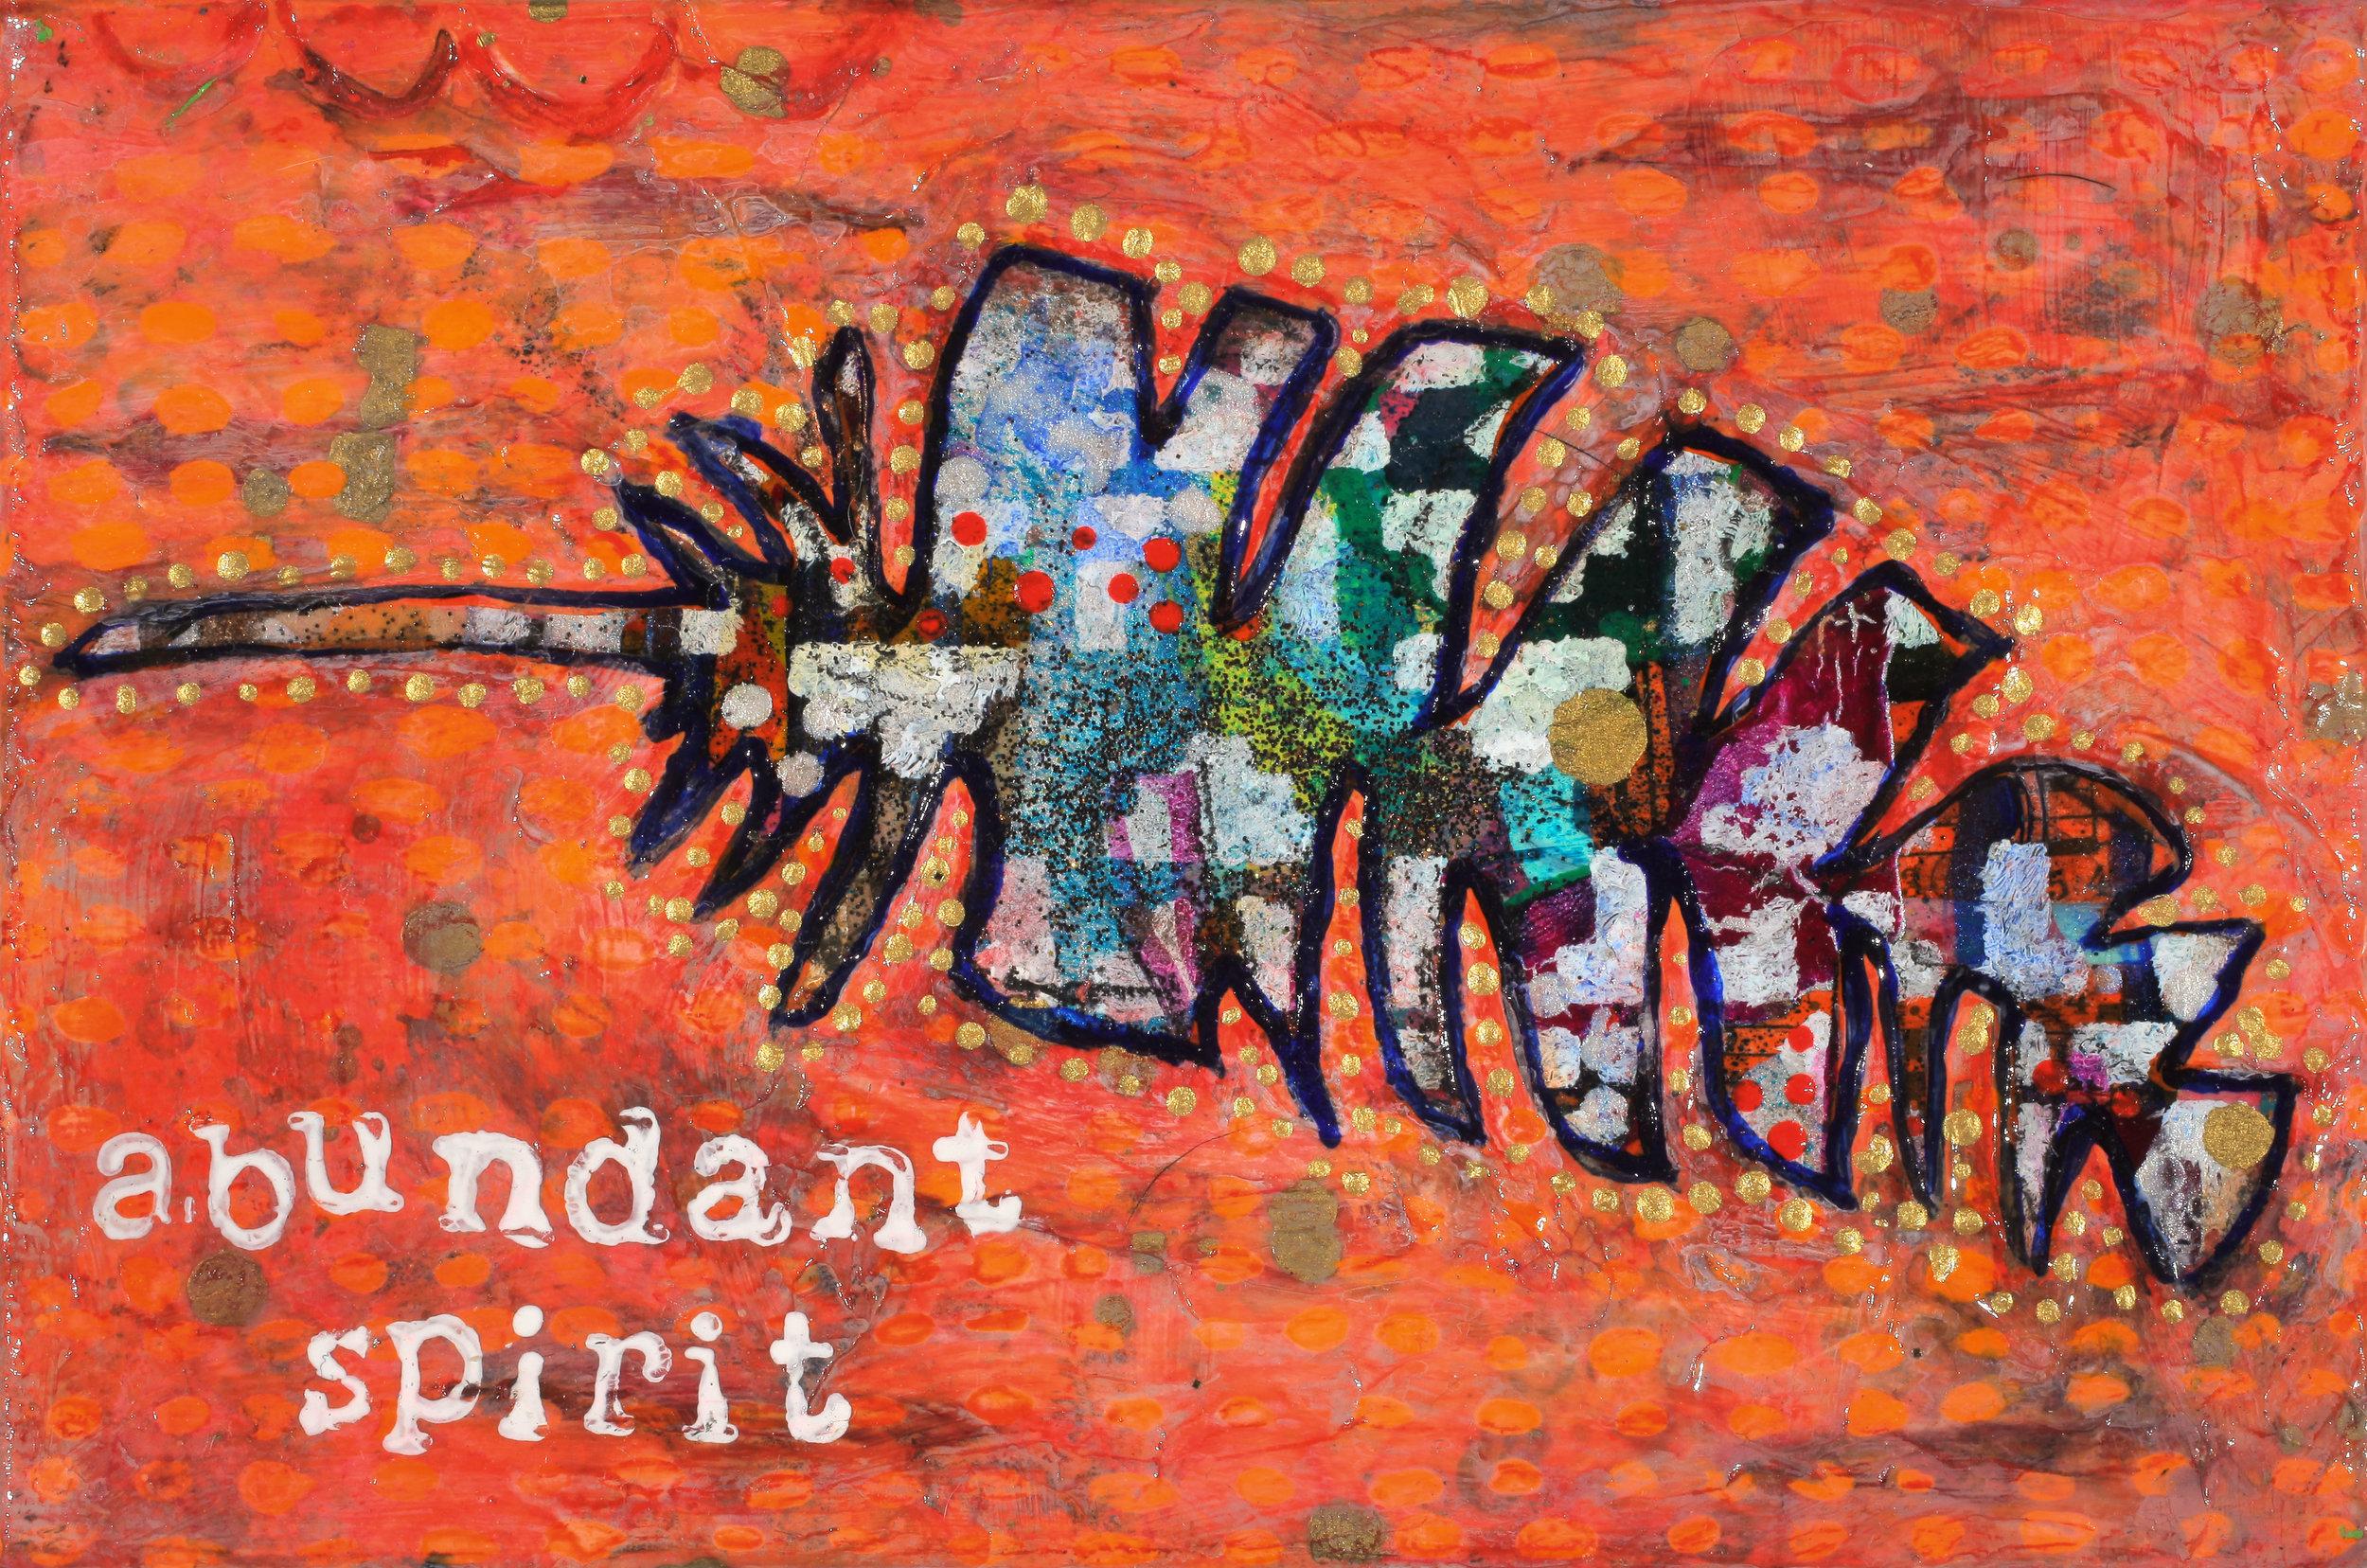 Abundant Spirit